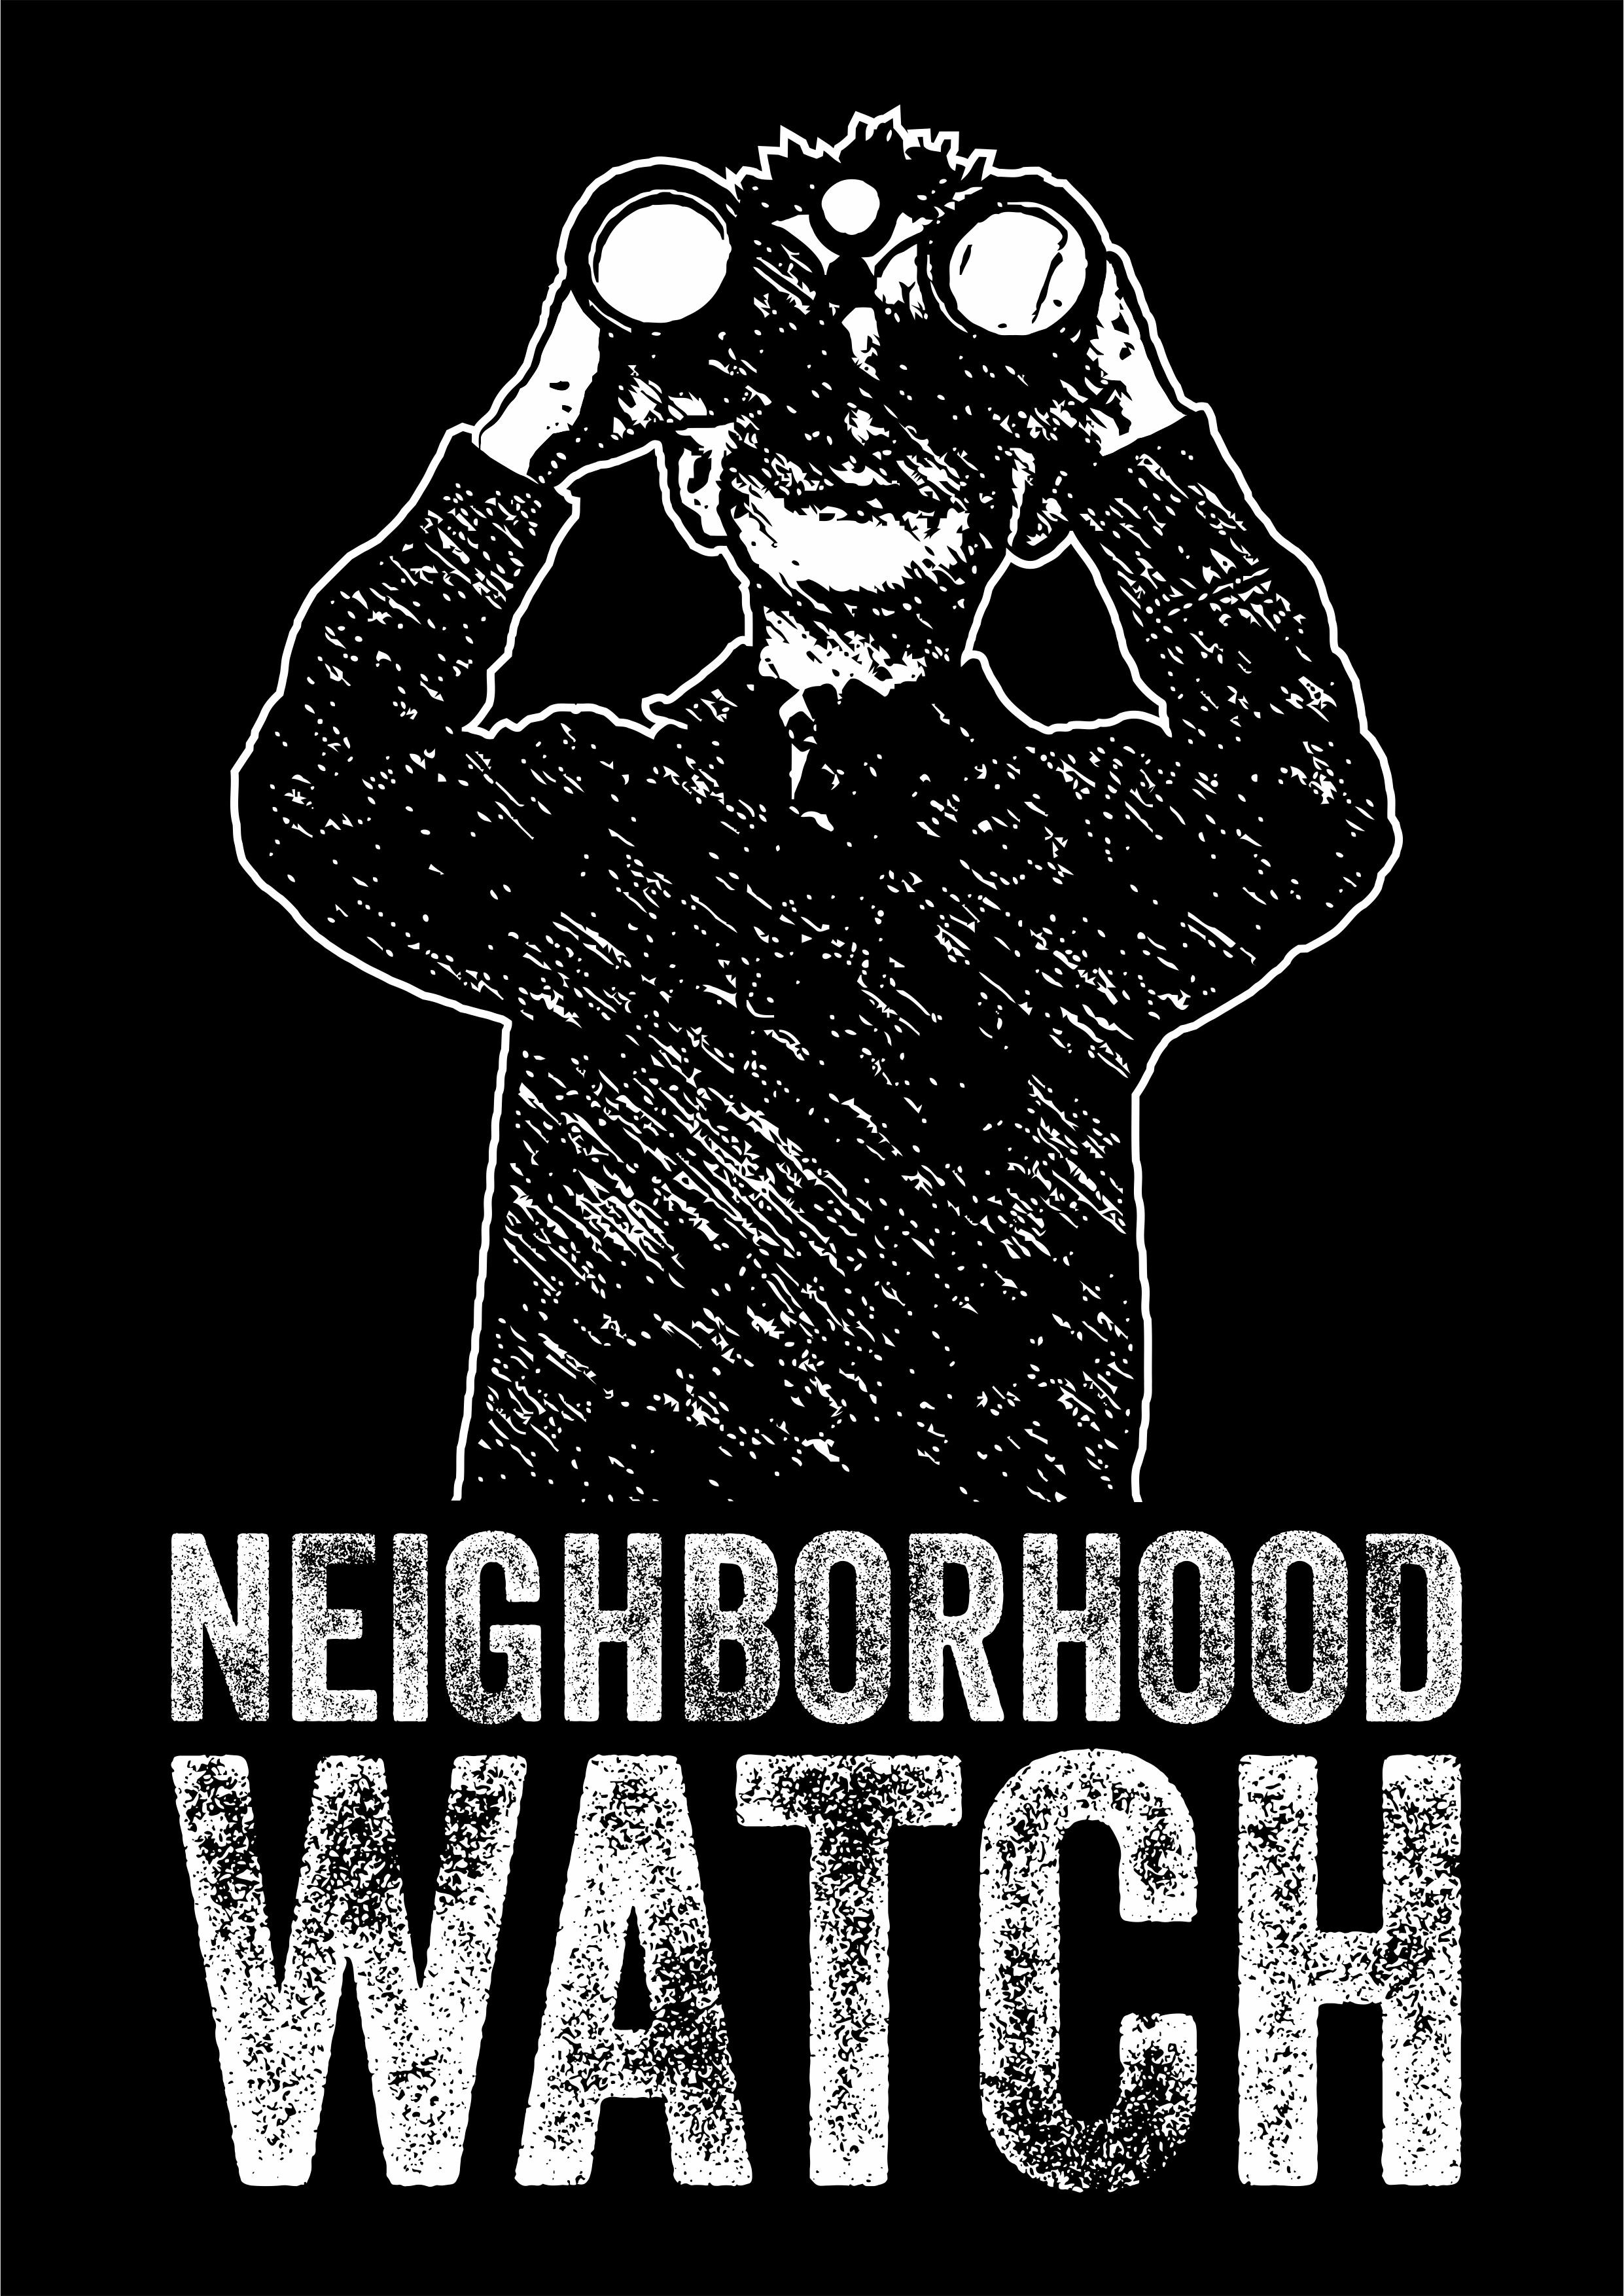 Creativity welcome for church logo inspires by neighborhood watch